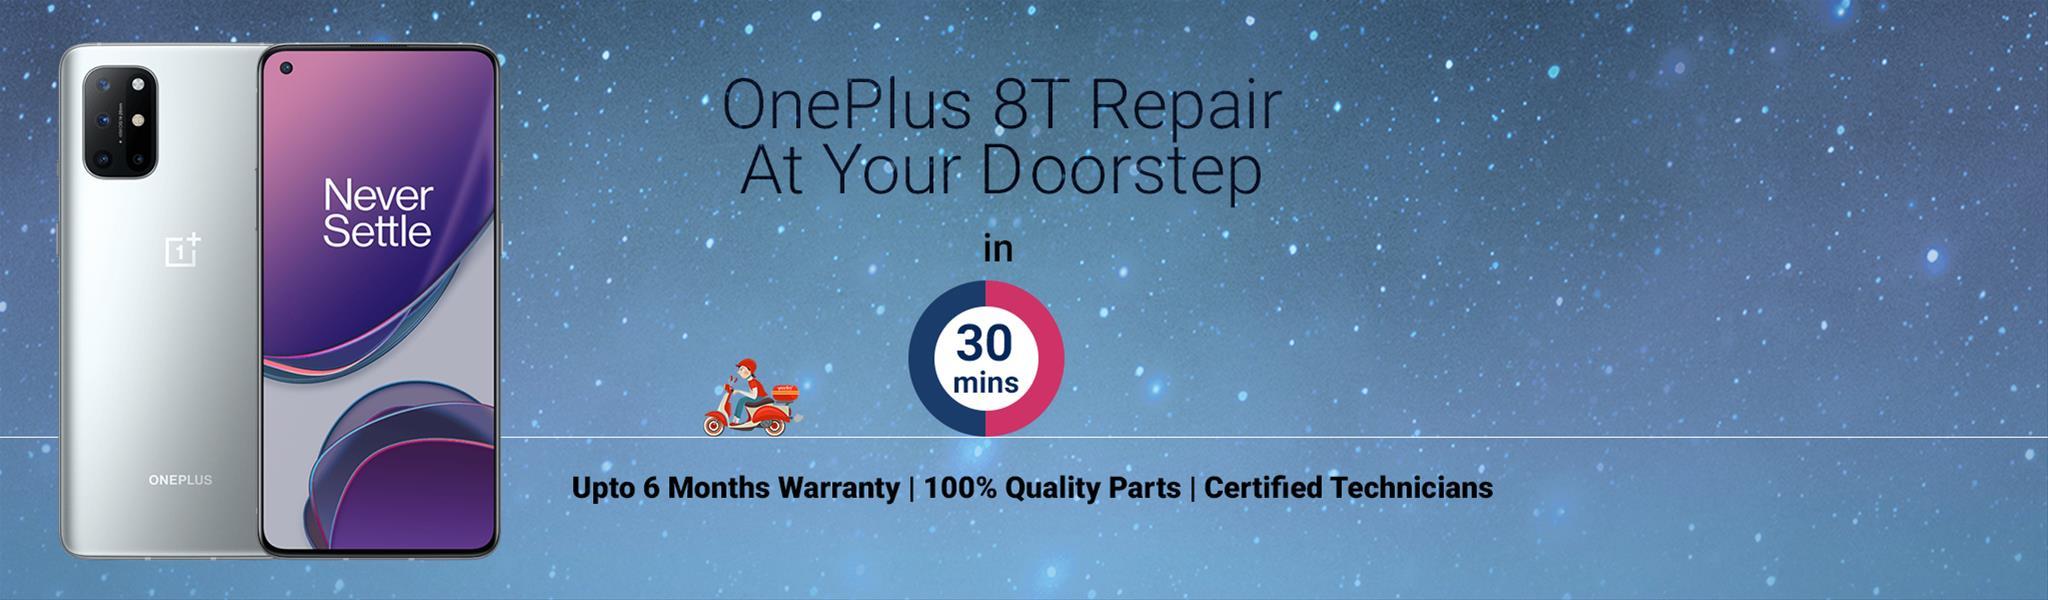 oneplus-8t-repair.jpg